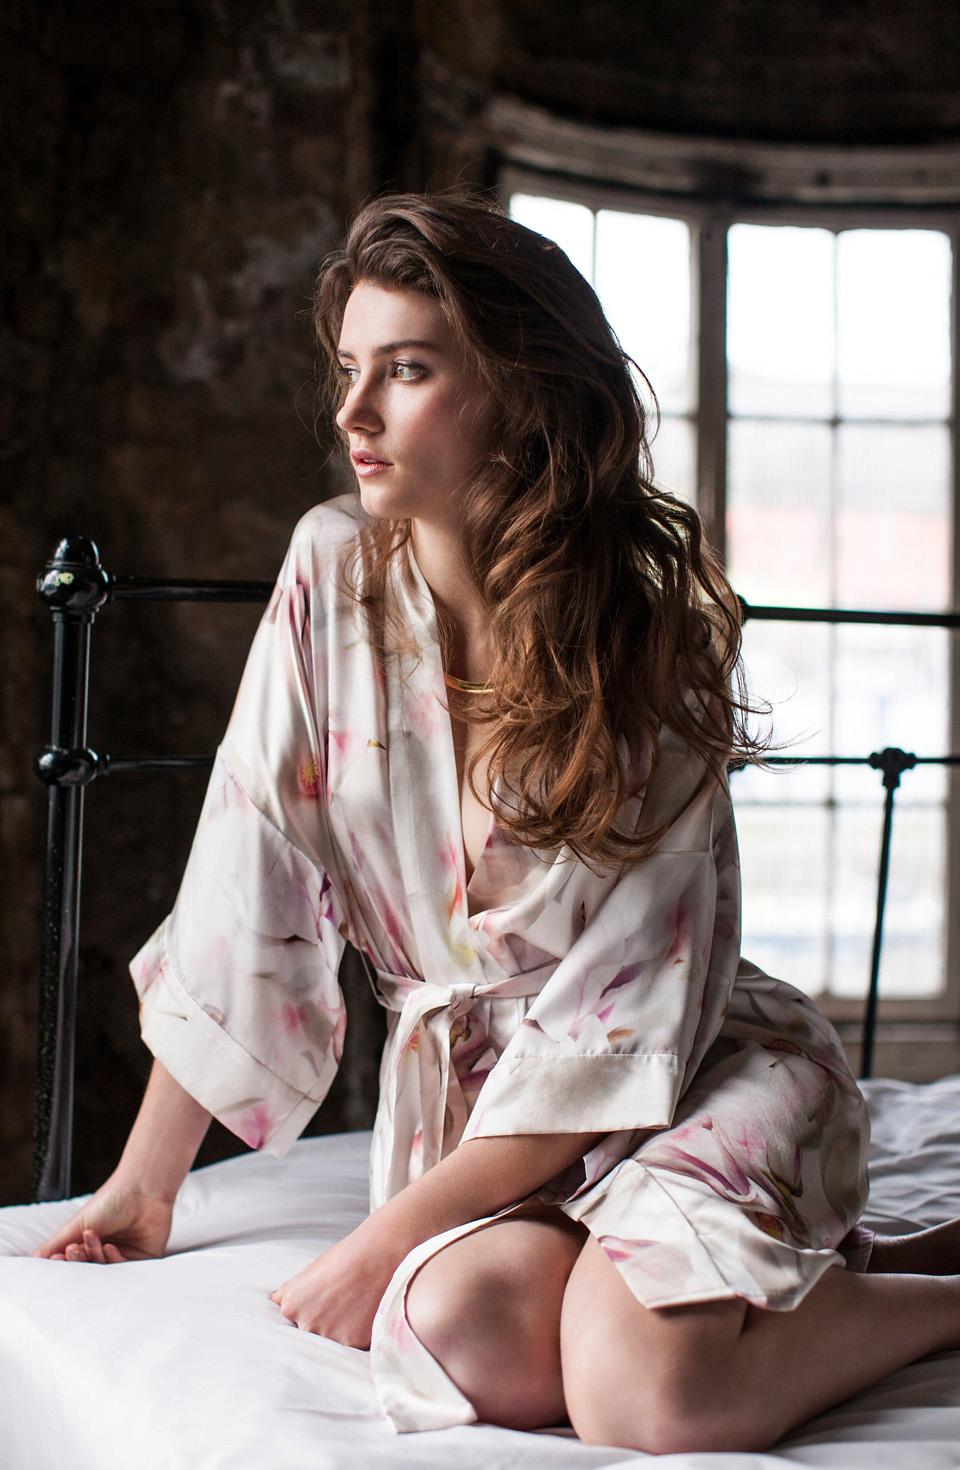 Introducing 'Botanica' From Violet & Wren – Luxury Silk Loungewear (Bridal Fashion Fashion & Beauty Get Inspired Supplier Spotlight )